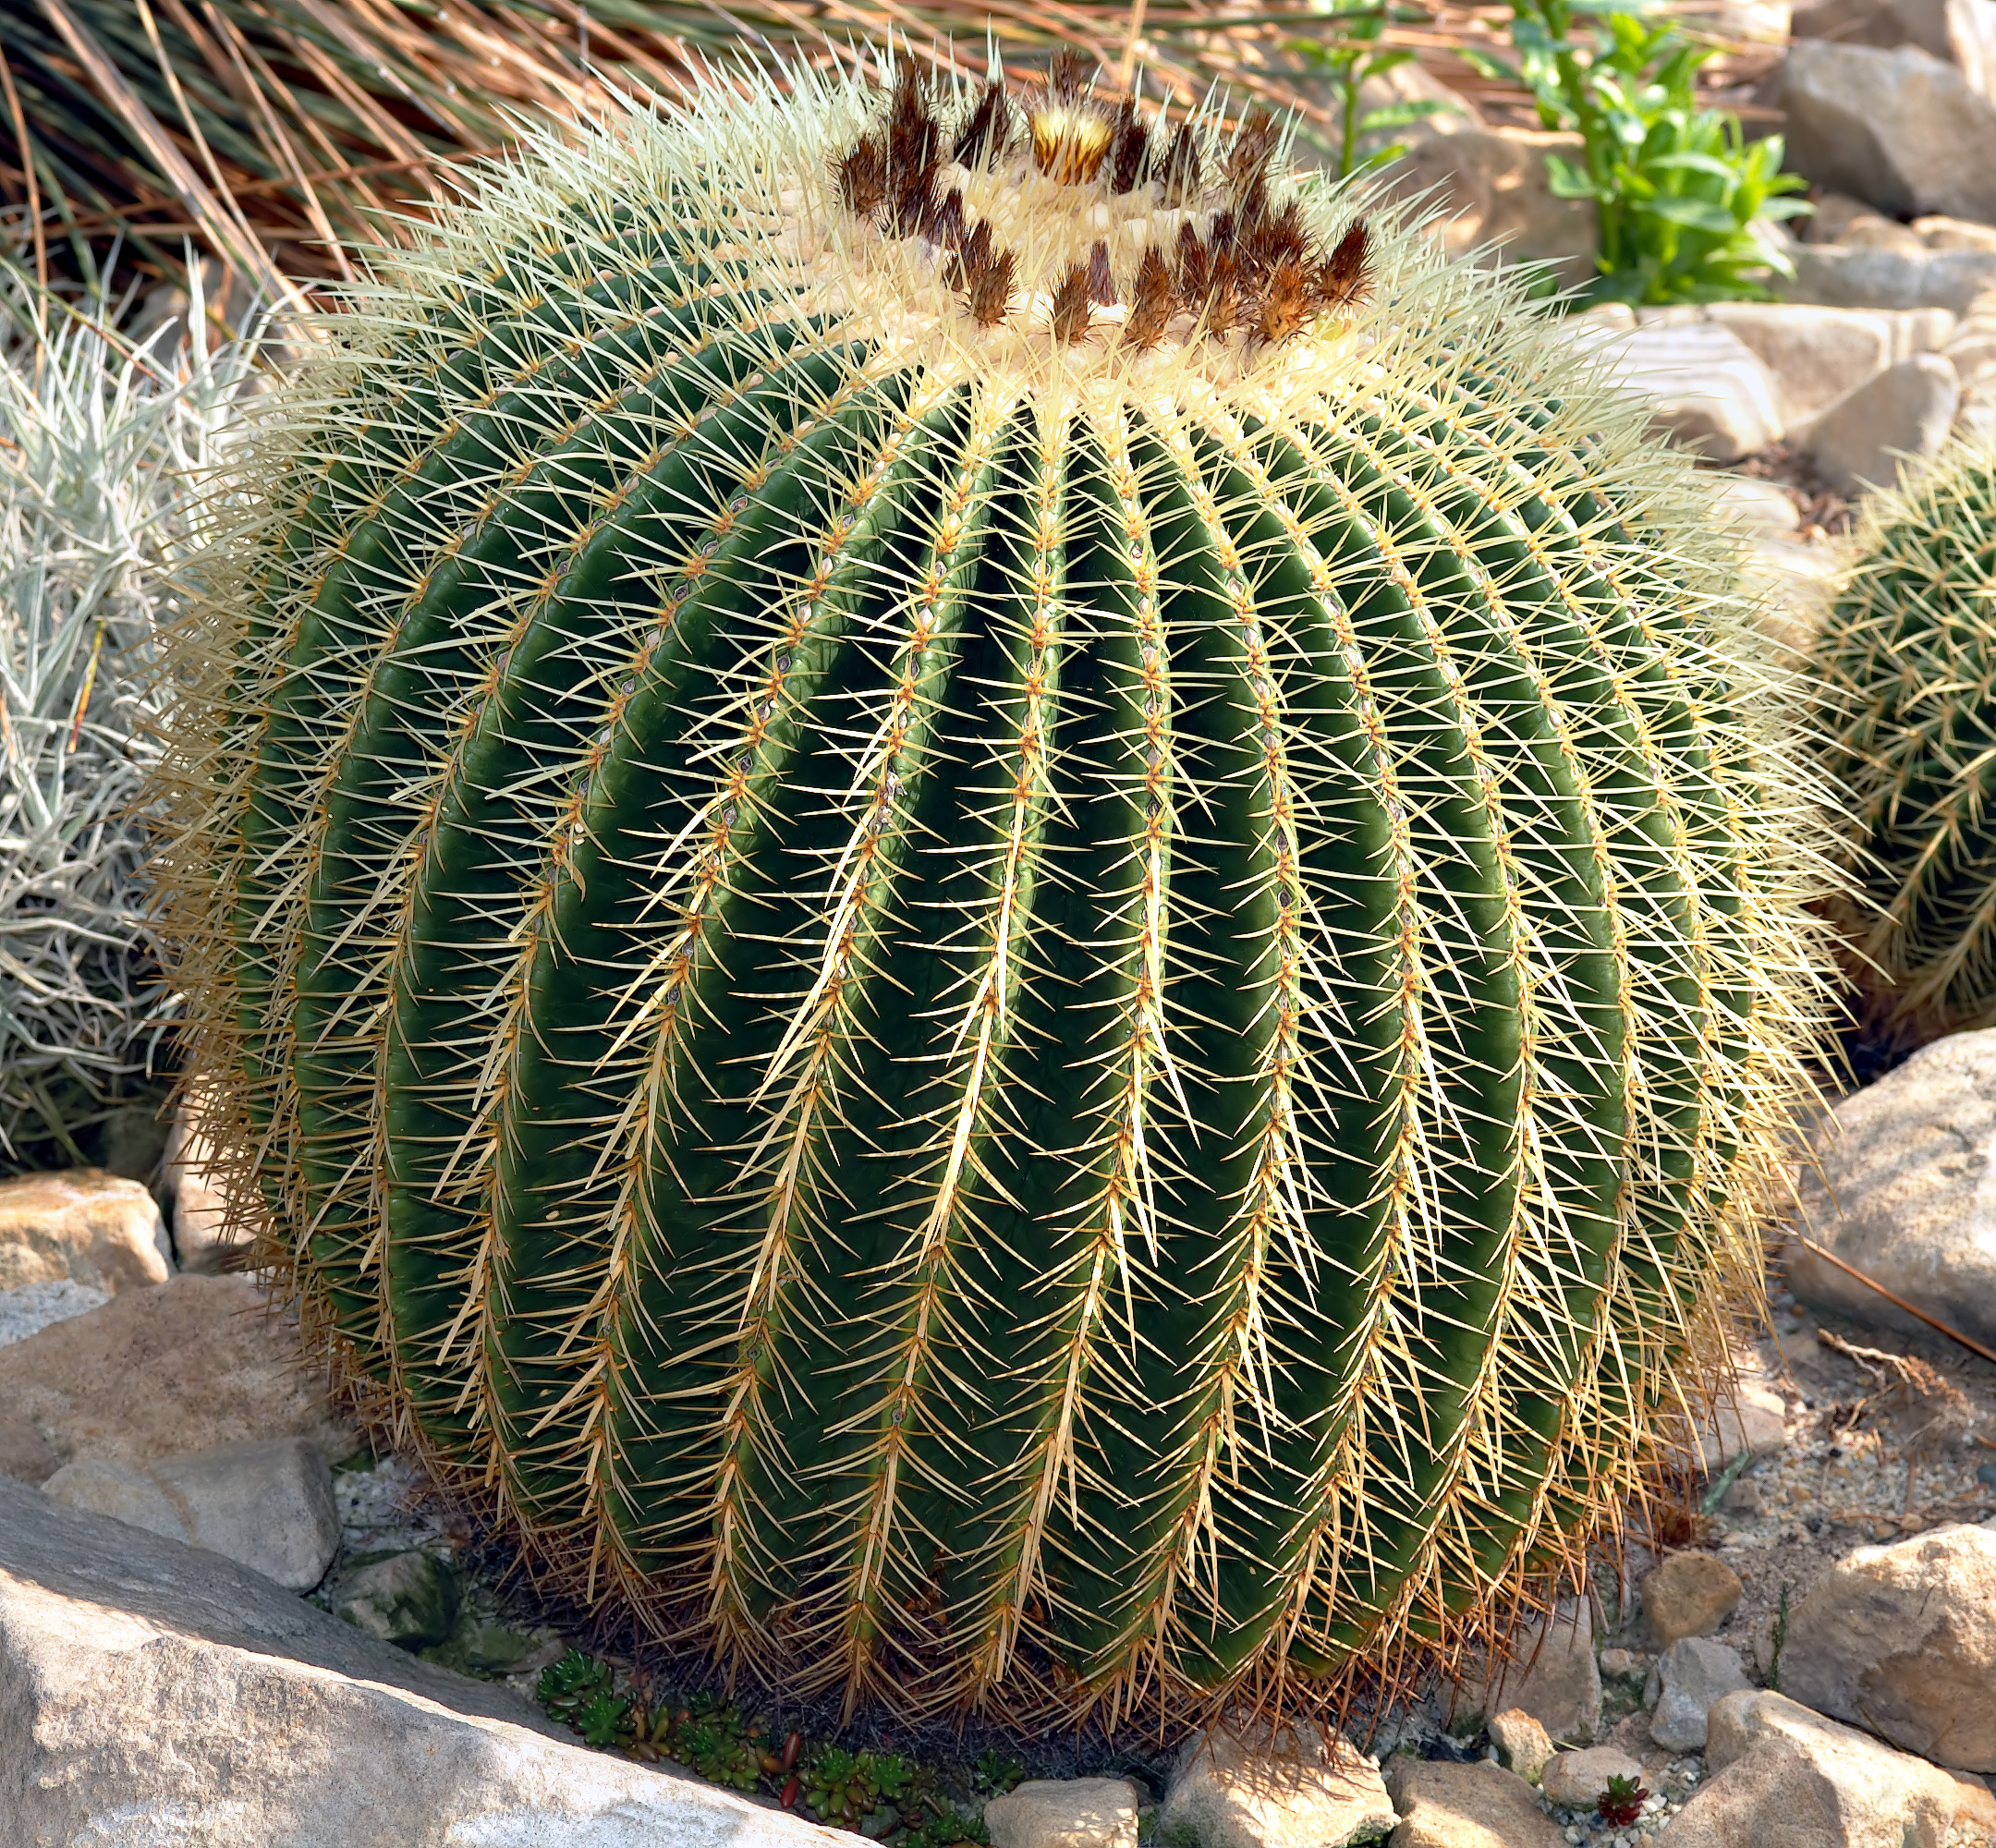 Echinocactus Grusonii – Coussin de belle mère